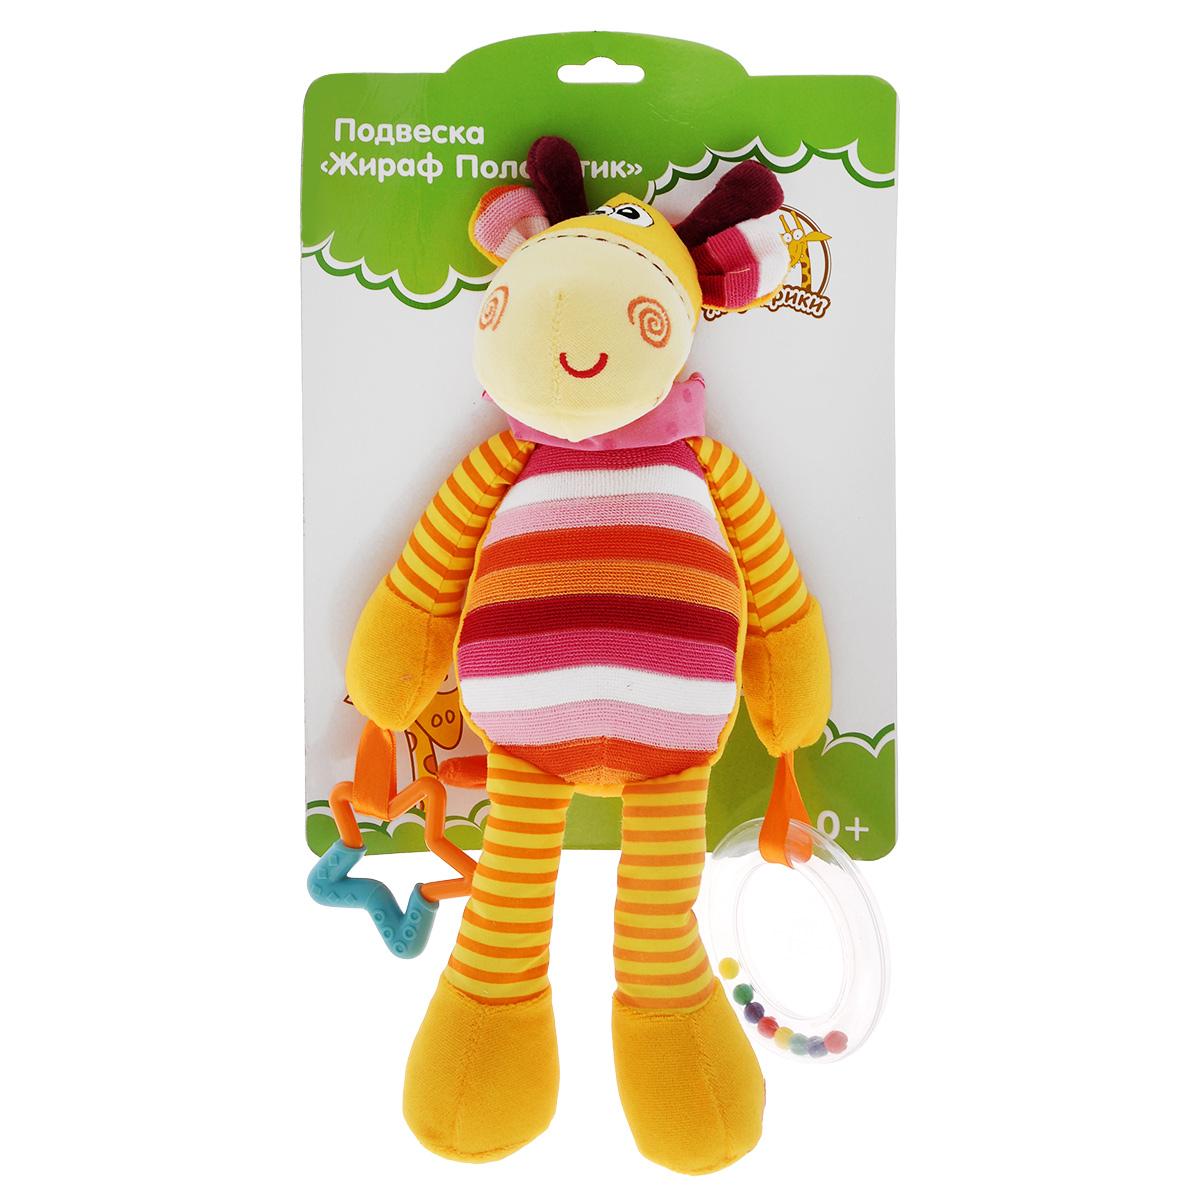 Развивающая игрушка Жирафики